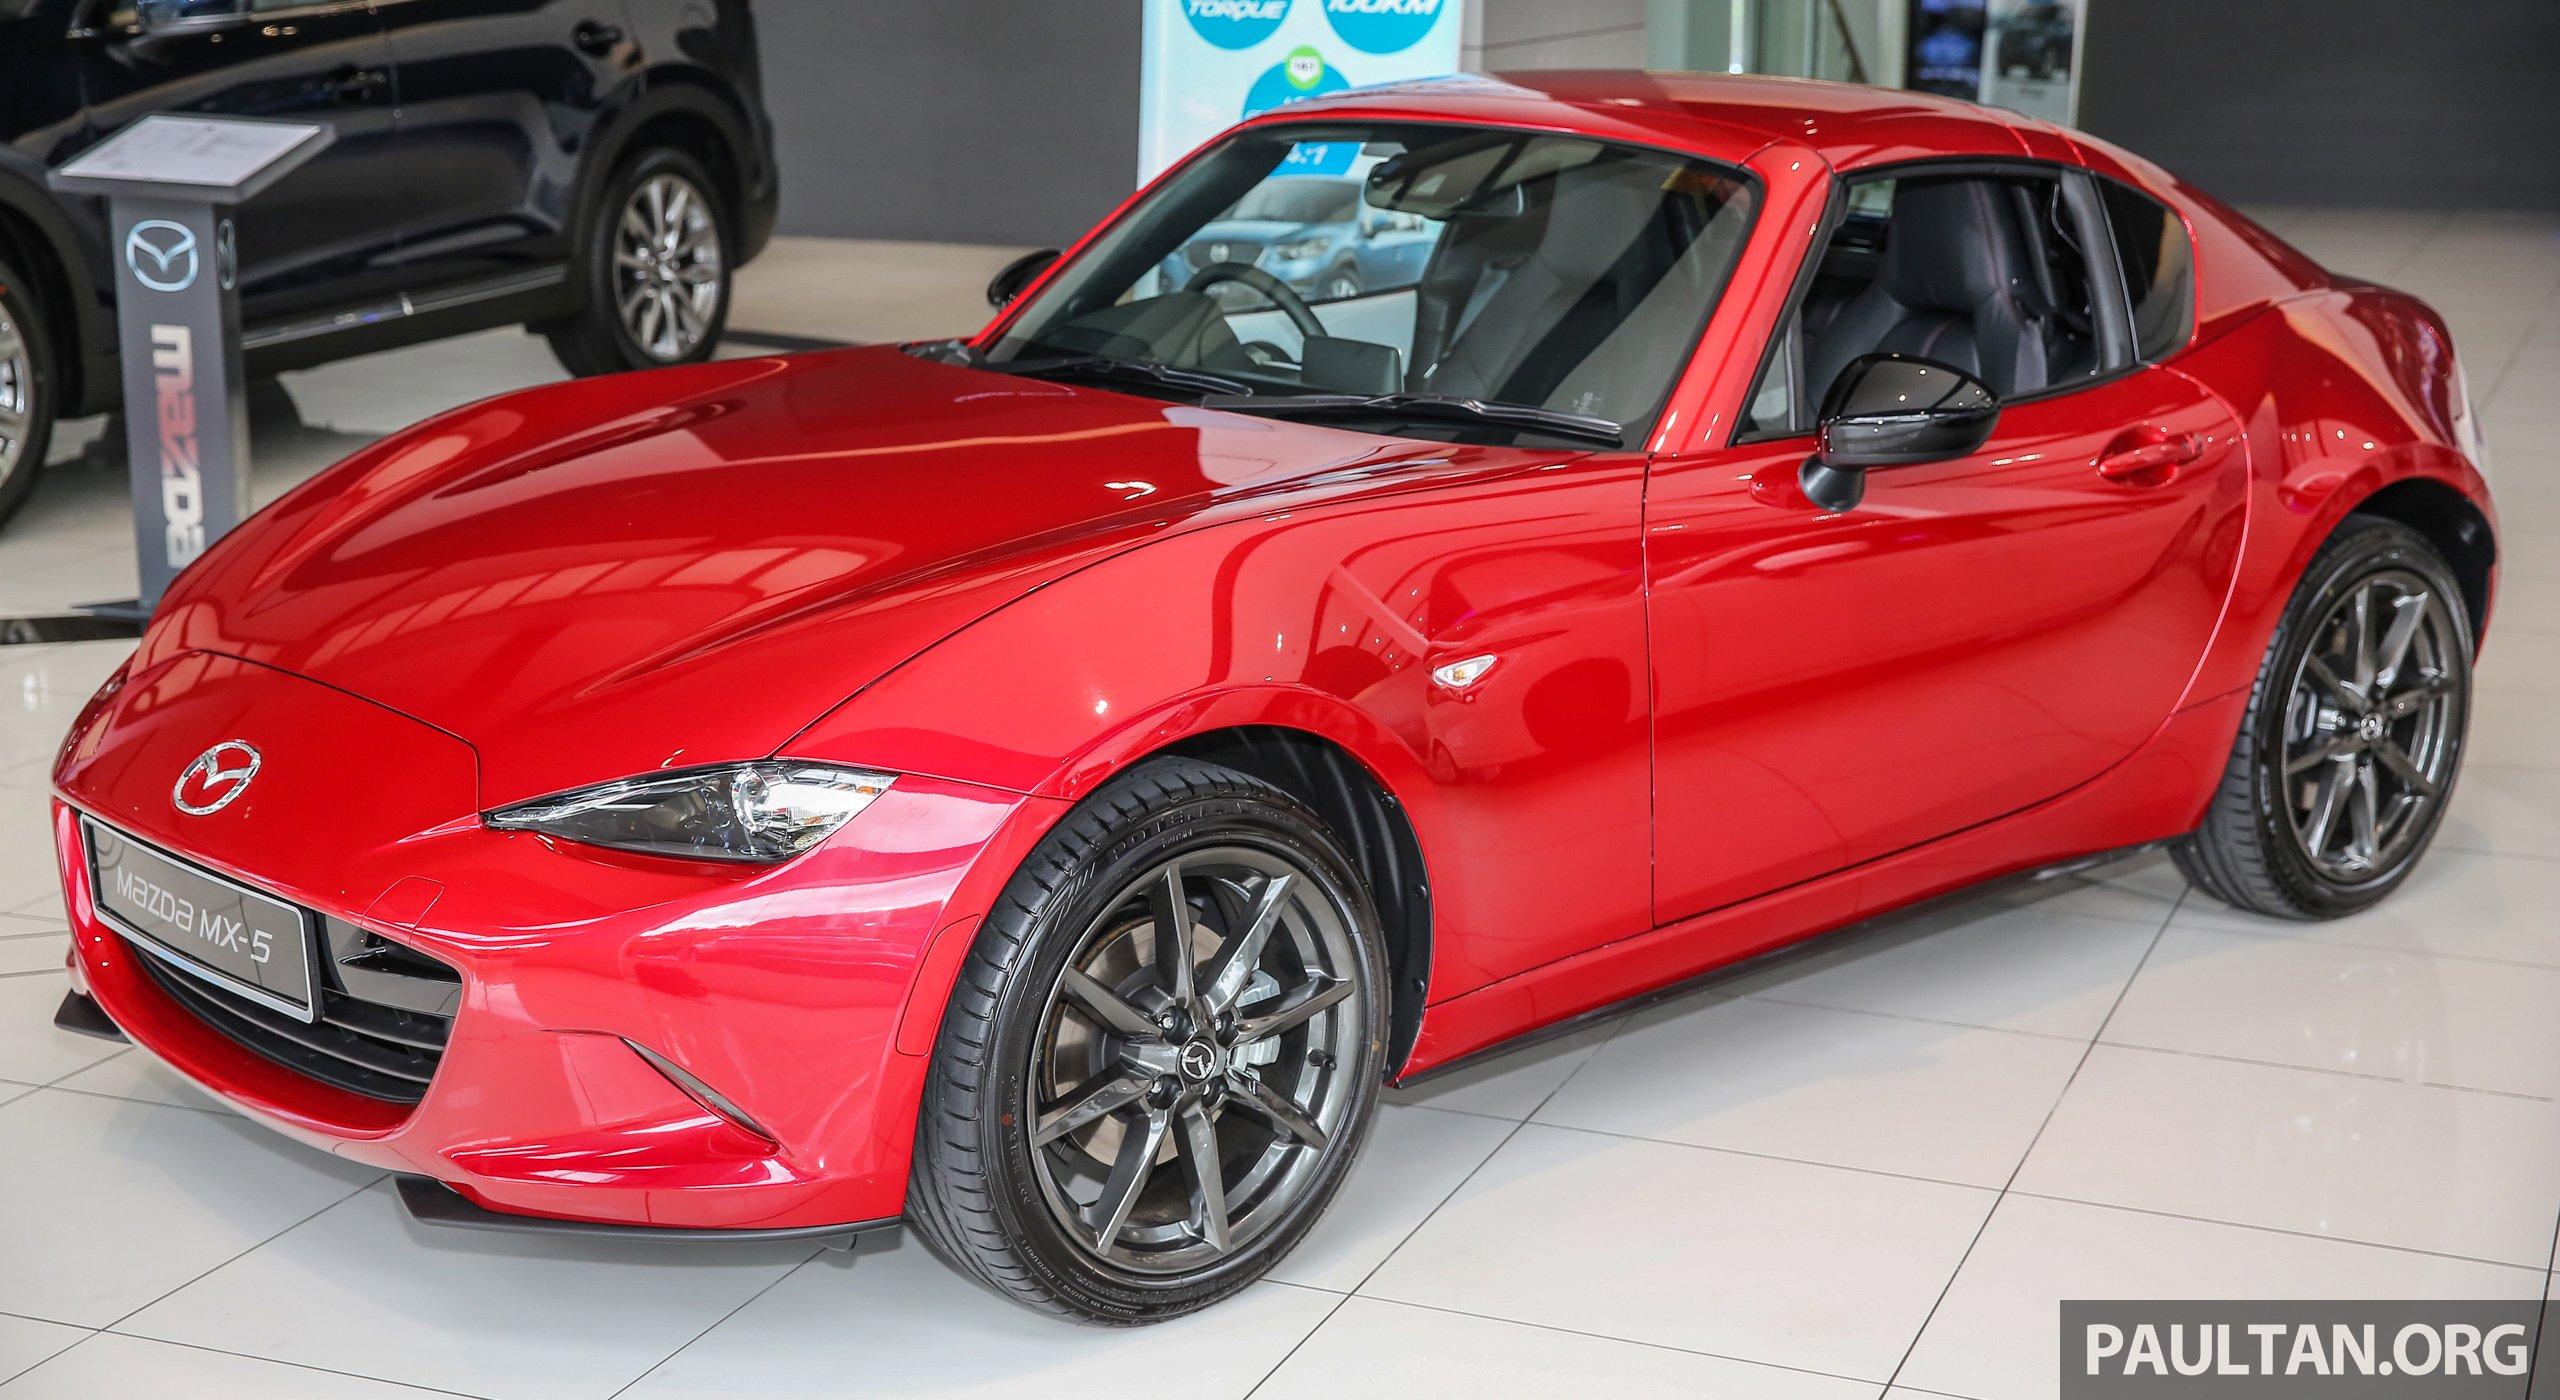 2017 Mx 5 Rf >> Mazda MX-5 RF in Malaysia – 2.0L, auto and manual Paul Tan - Image 616340